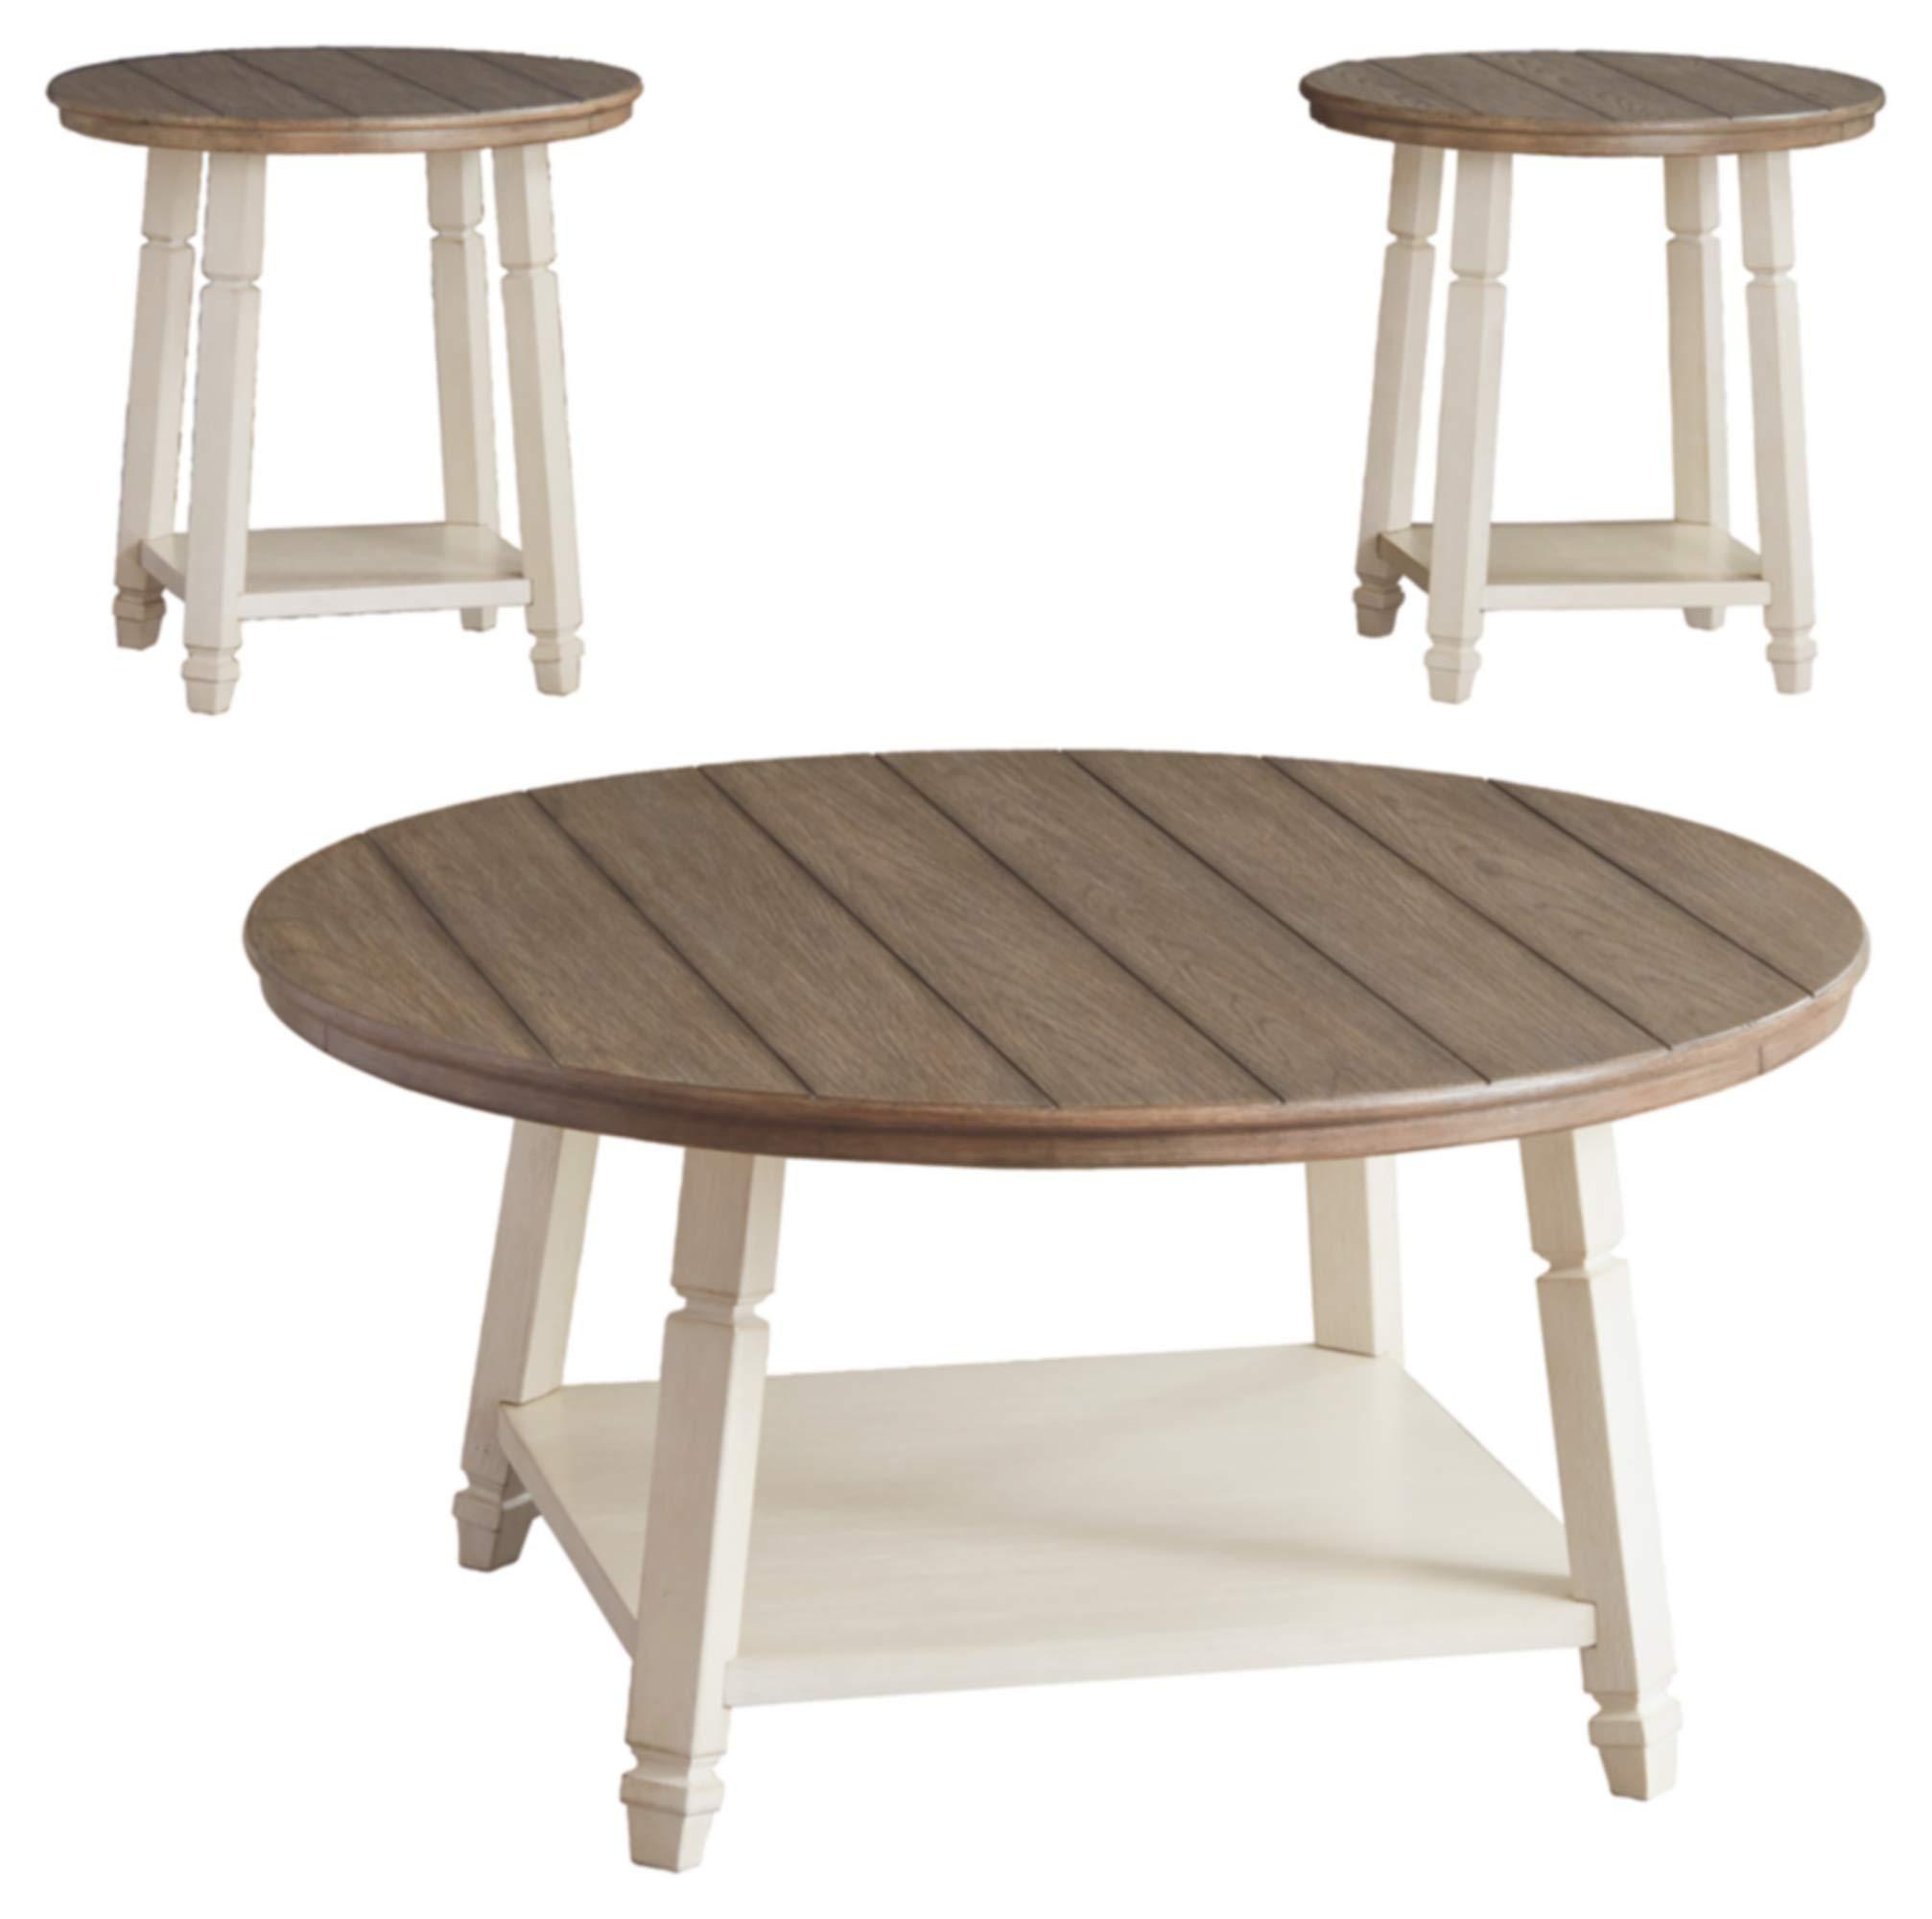 Ashley Furniture Signature Design - Bolanbrook Occasional Table Set - Set of 3 - Farmhouse - Antique White by Signature Design by Ashley